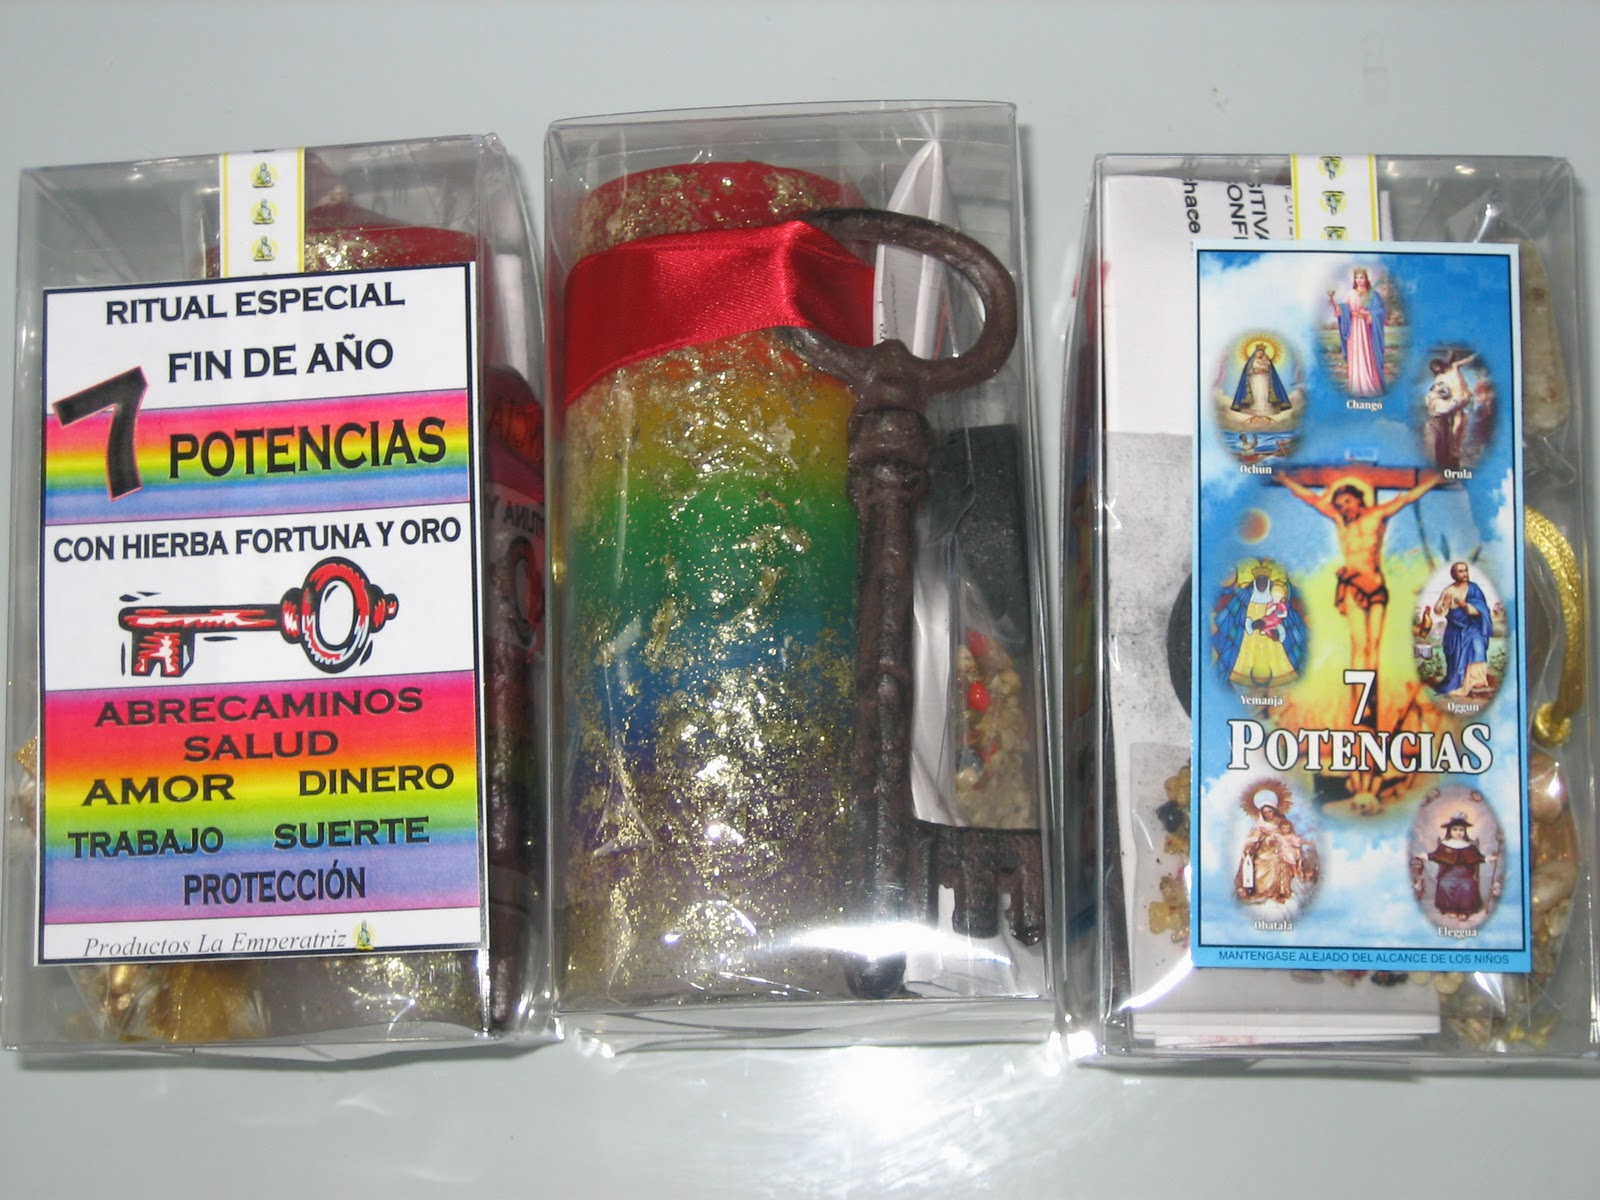 Merlin tu tienda m gica rituales de a o nuevo 2012 - Ritual para la suerte ...